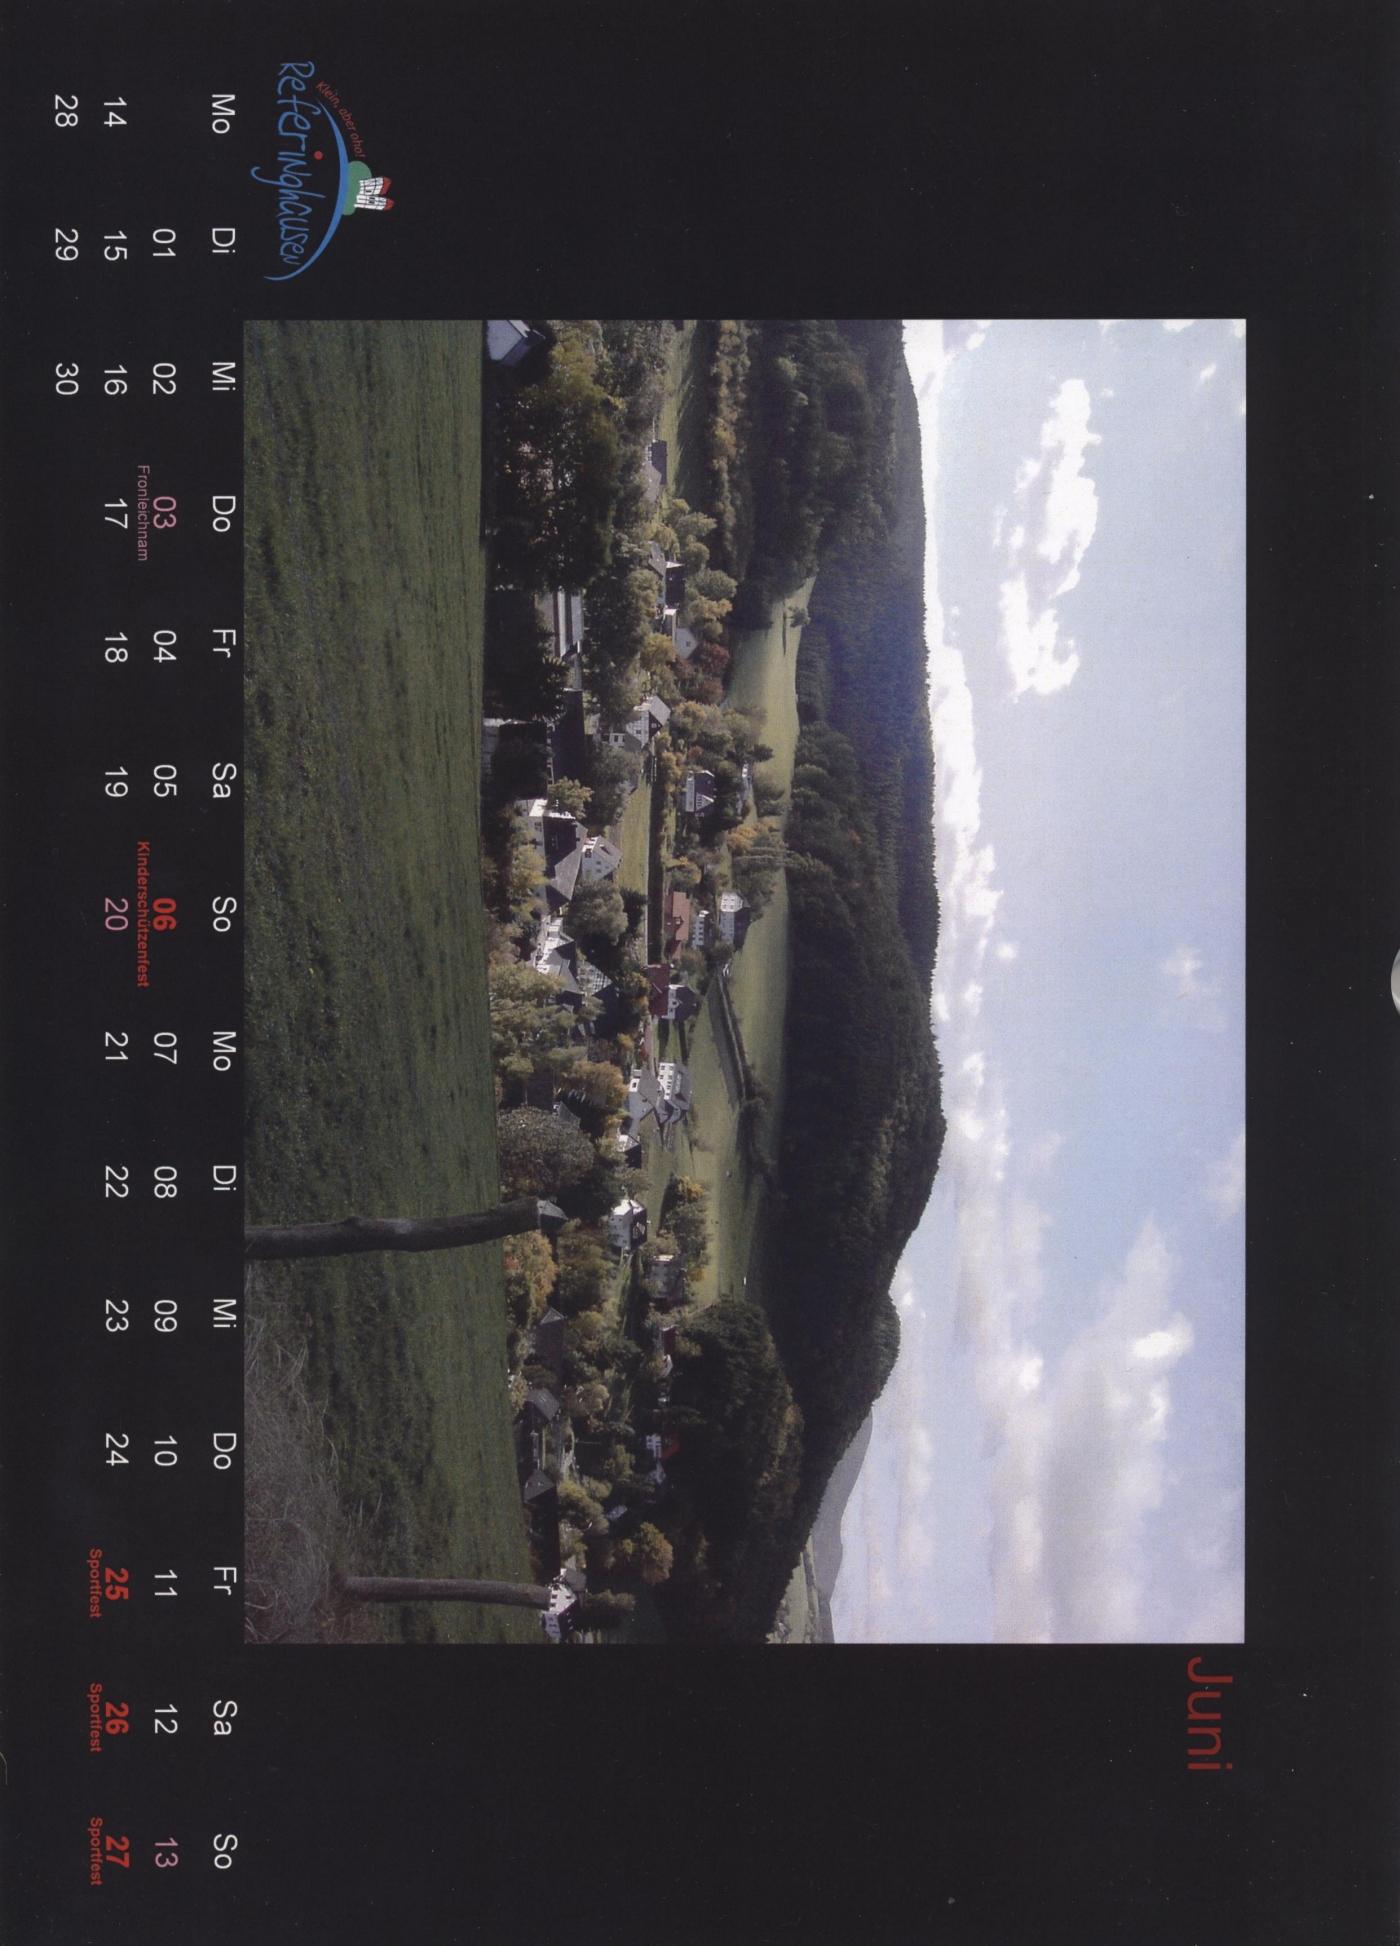 Kalender 2010 Teil 2